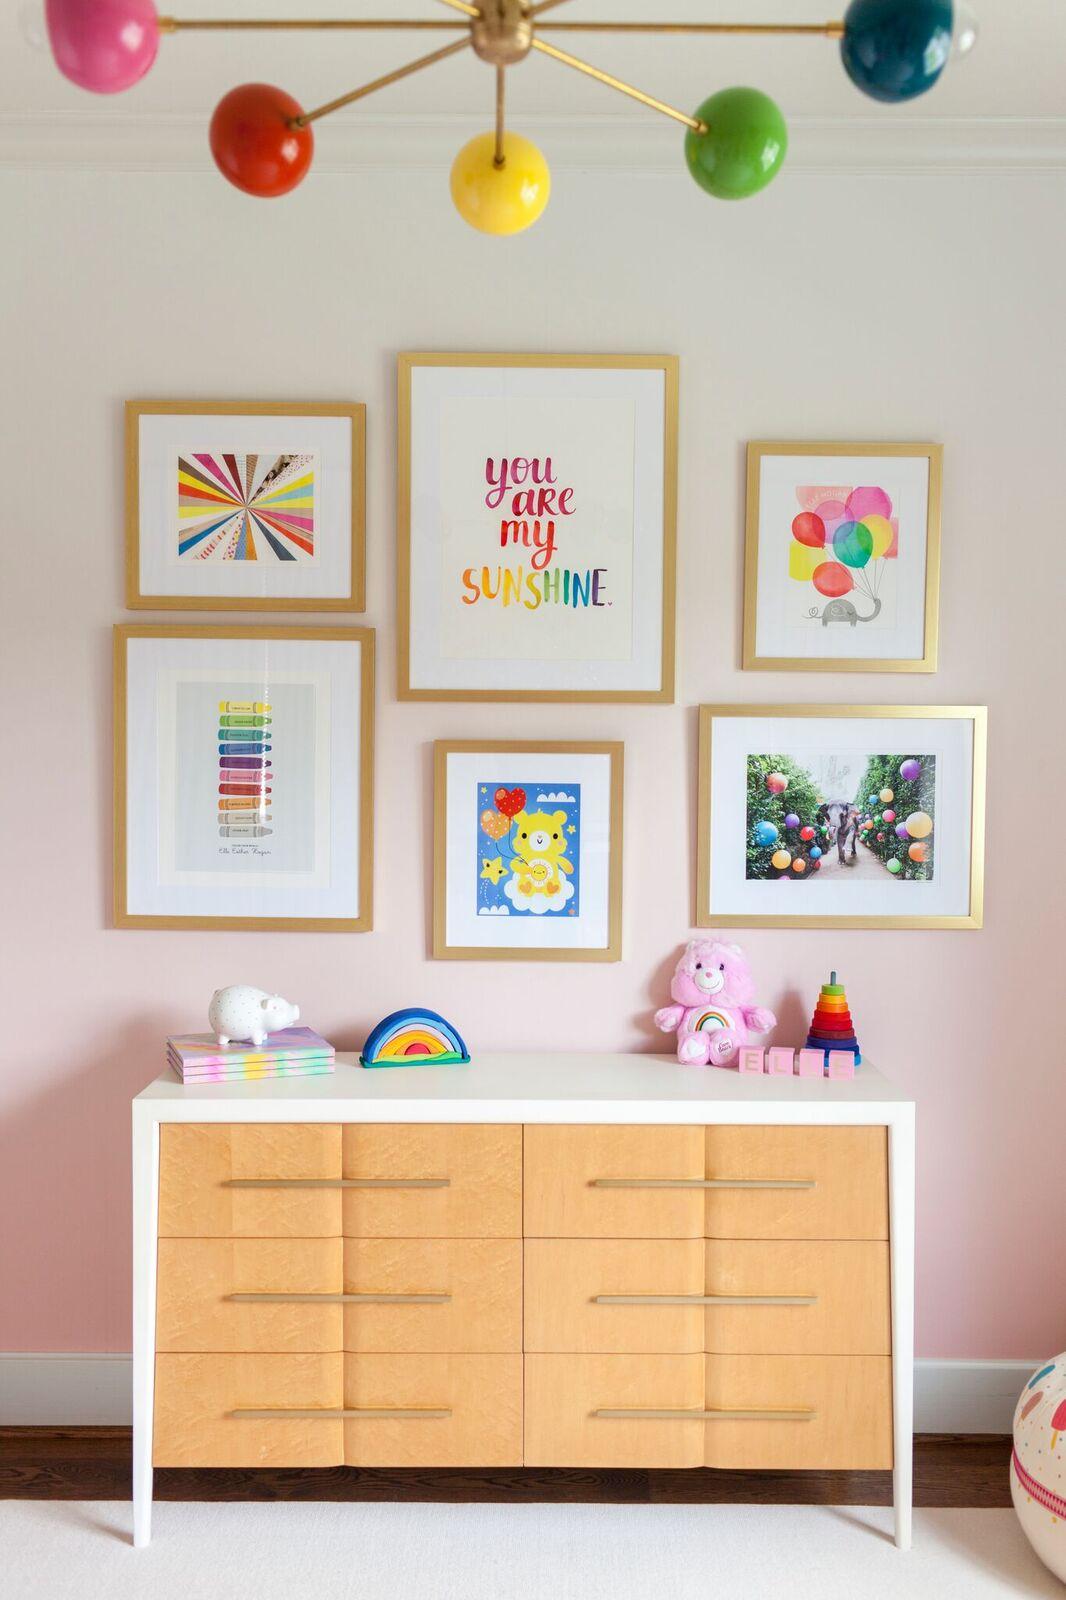 Gallery Wall Nursery, Laura U Interior Design